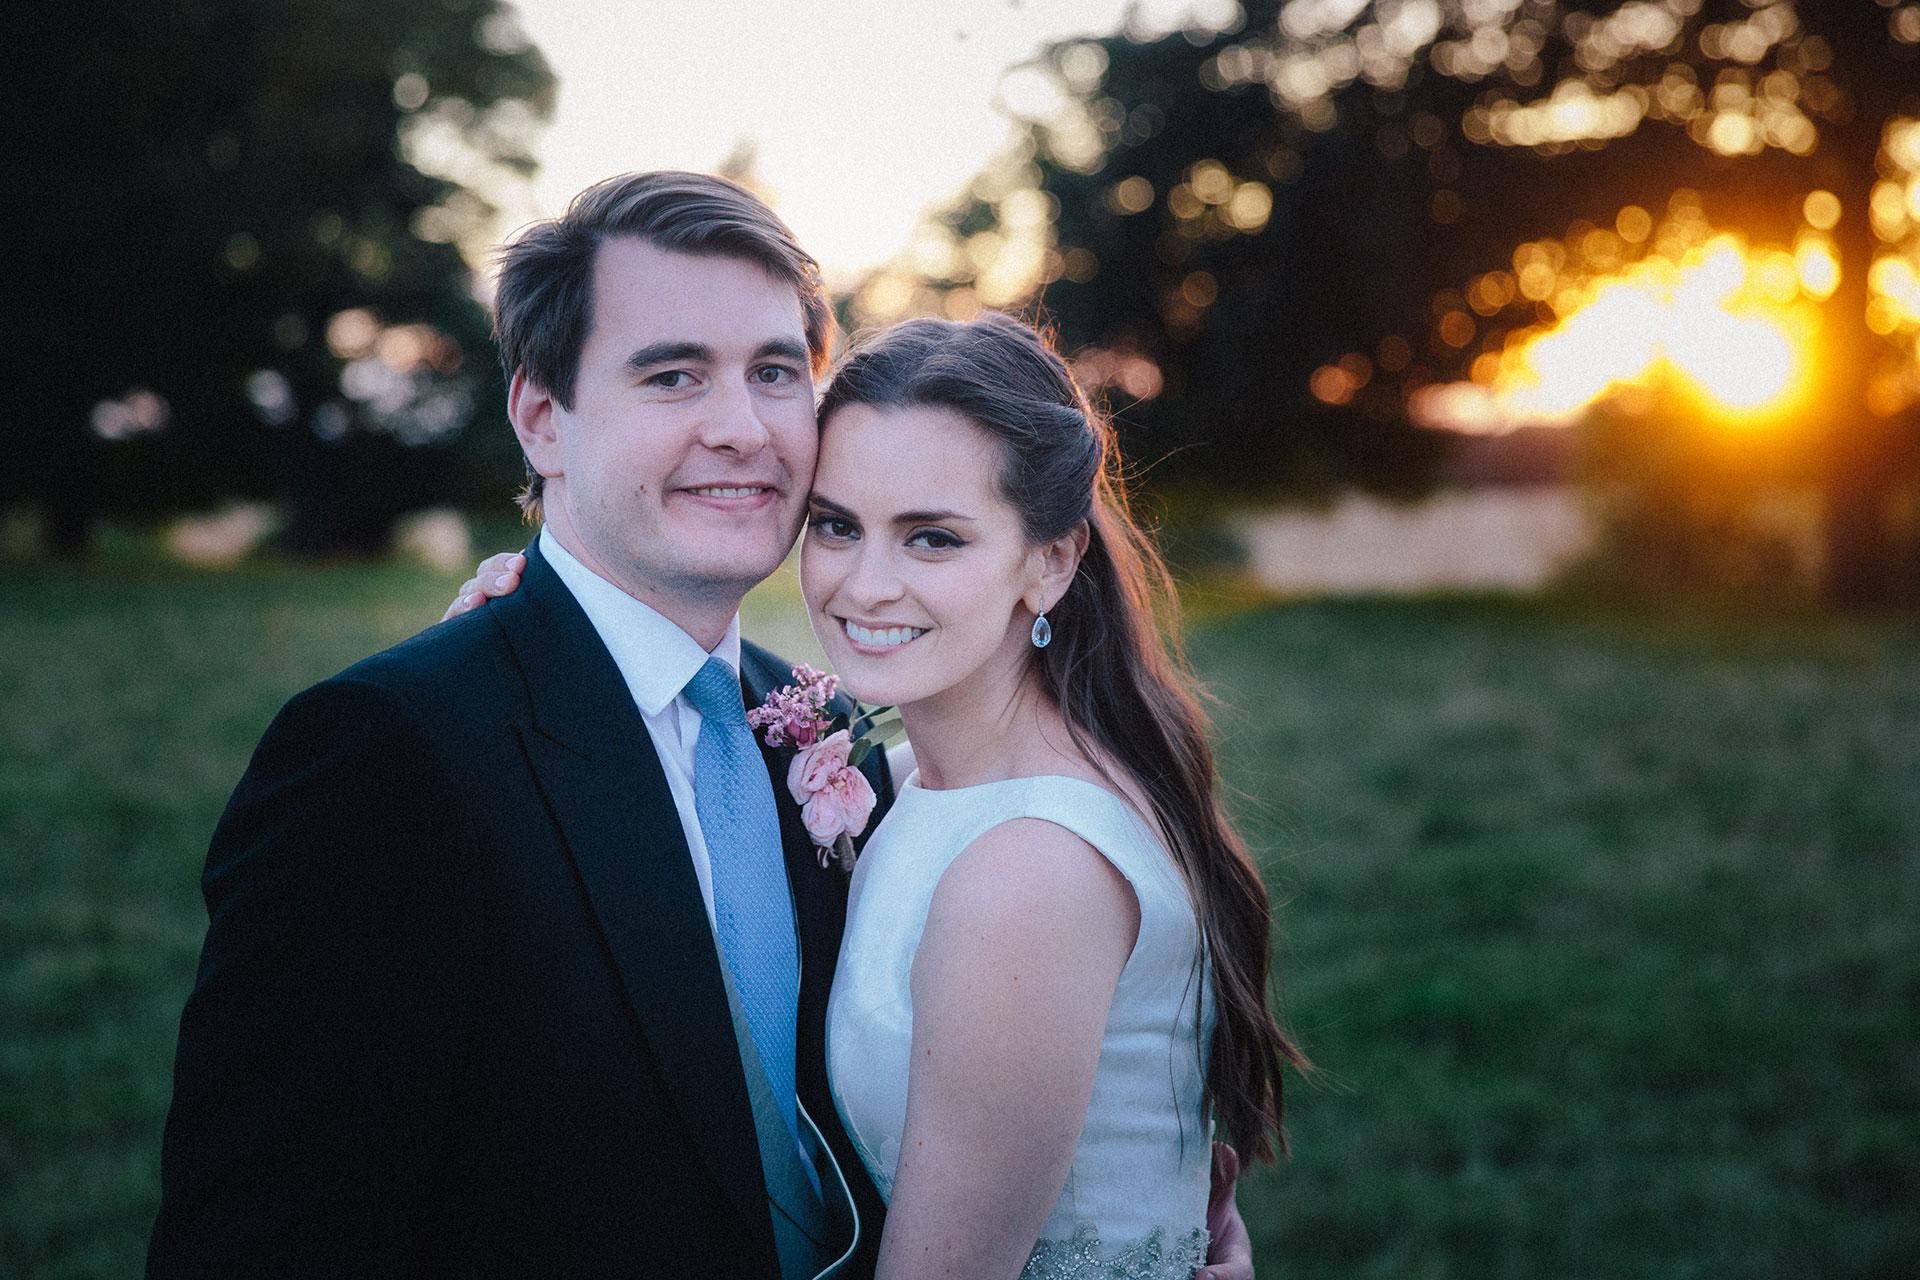 Langar-Hall-wedding-photographer-in-Nottinghamshire-Michael-Newington-Gray-101.jpg